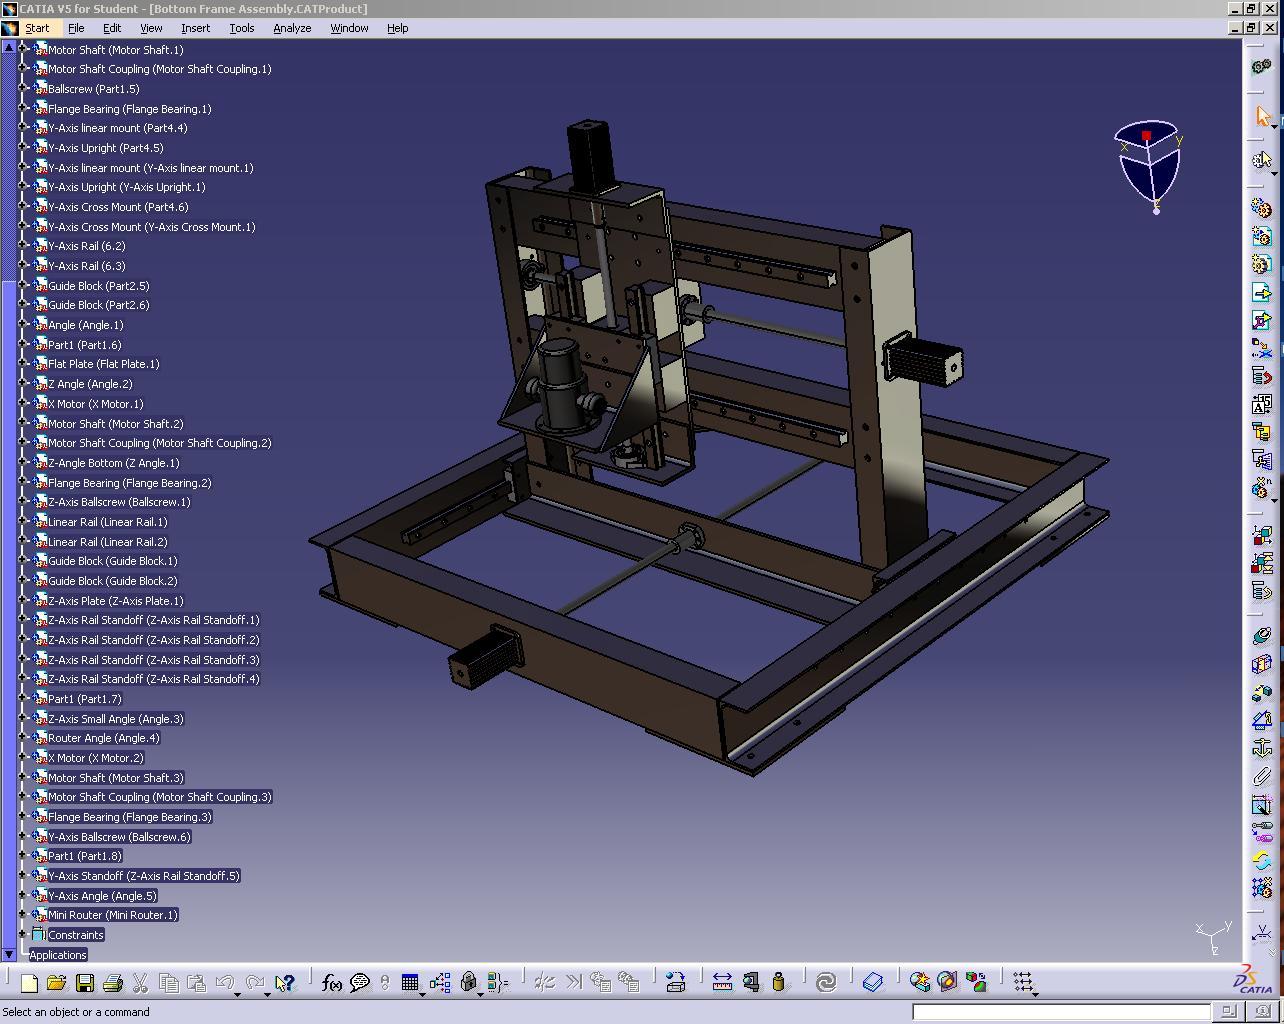 pin cnc 3 axis stepper motor driver board controller. Black Bedroom Furniture Sets. Home Design Ideas